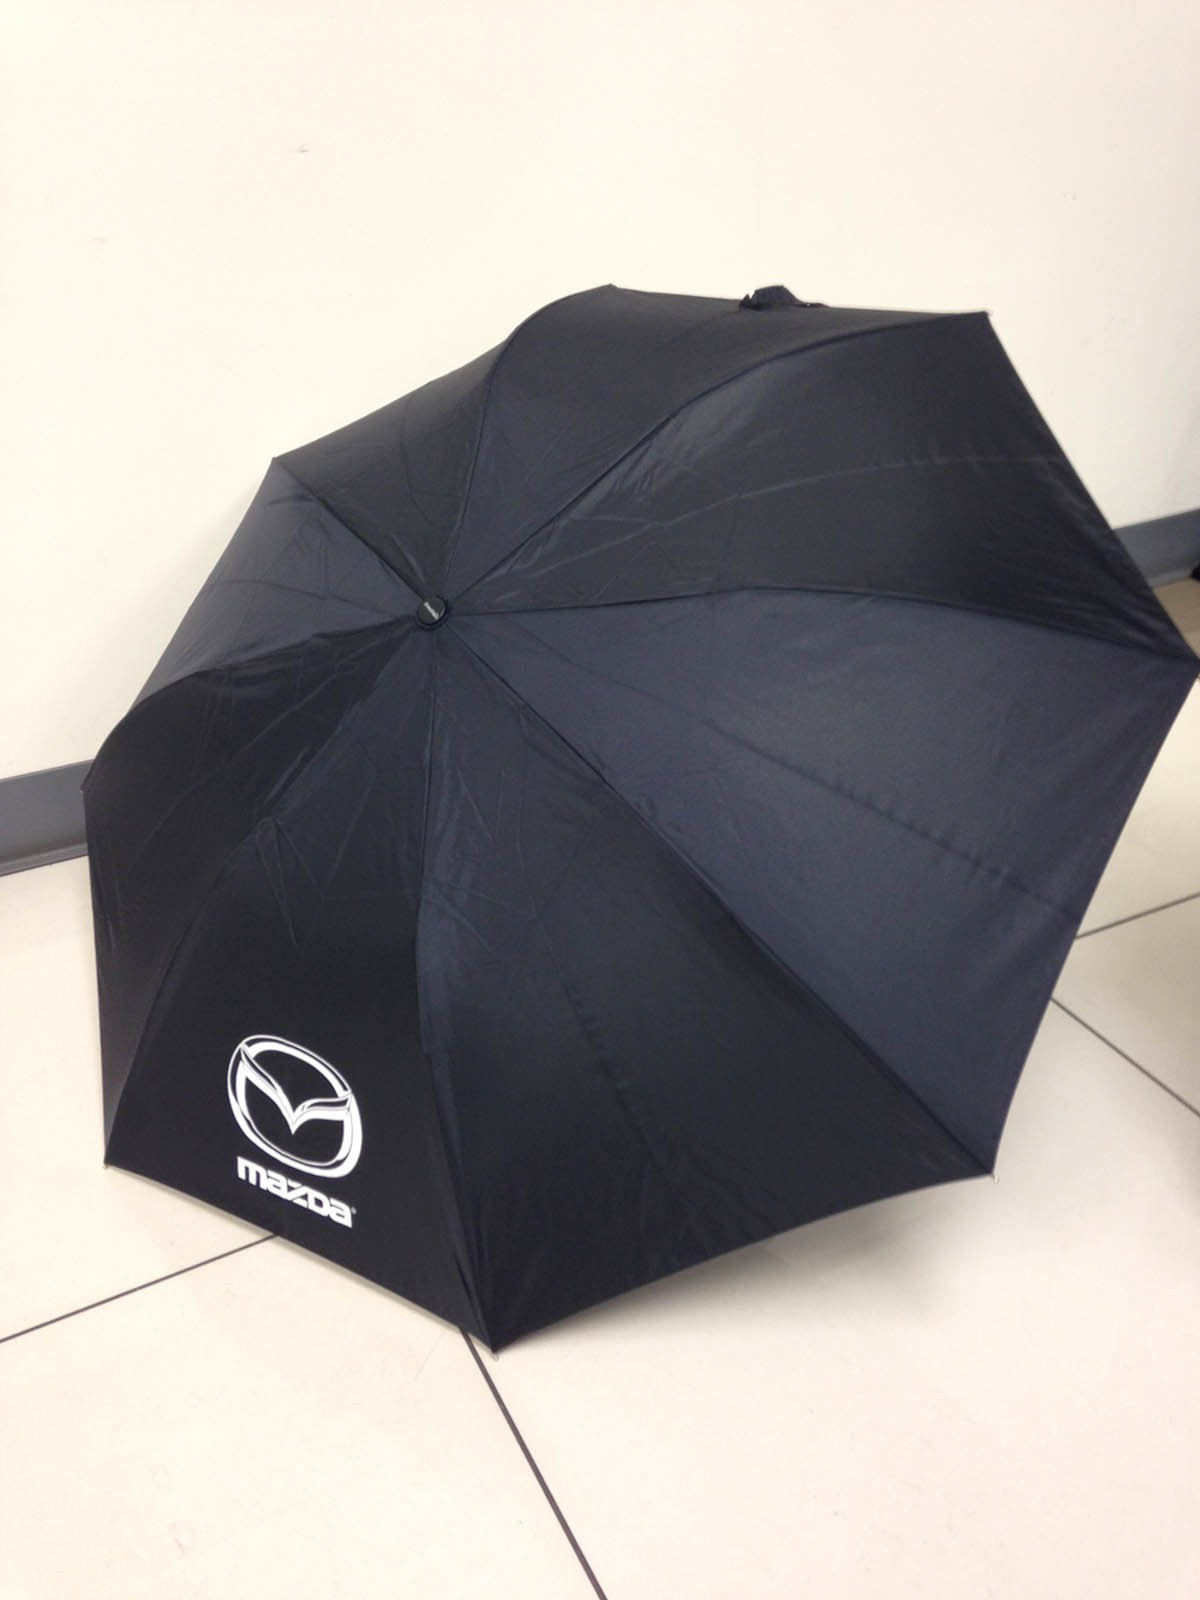 Mazda Umbrella